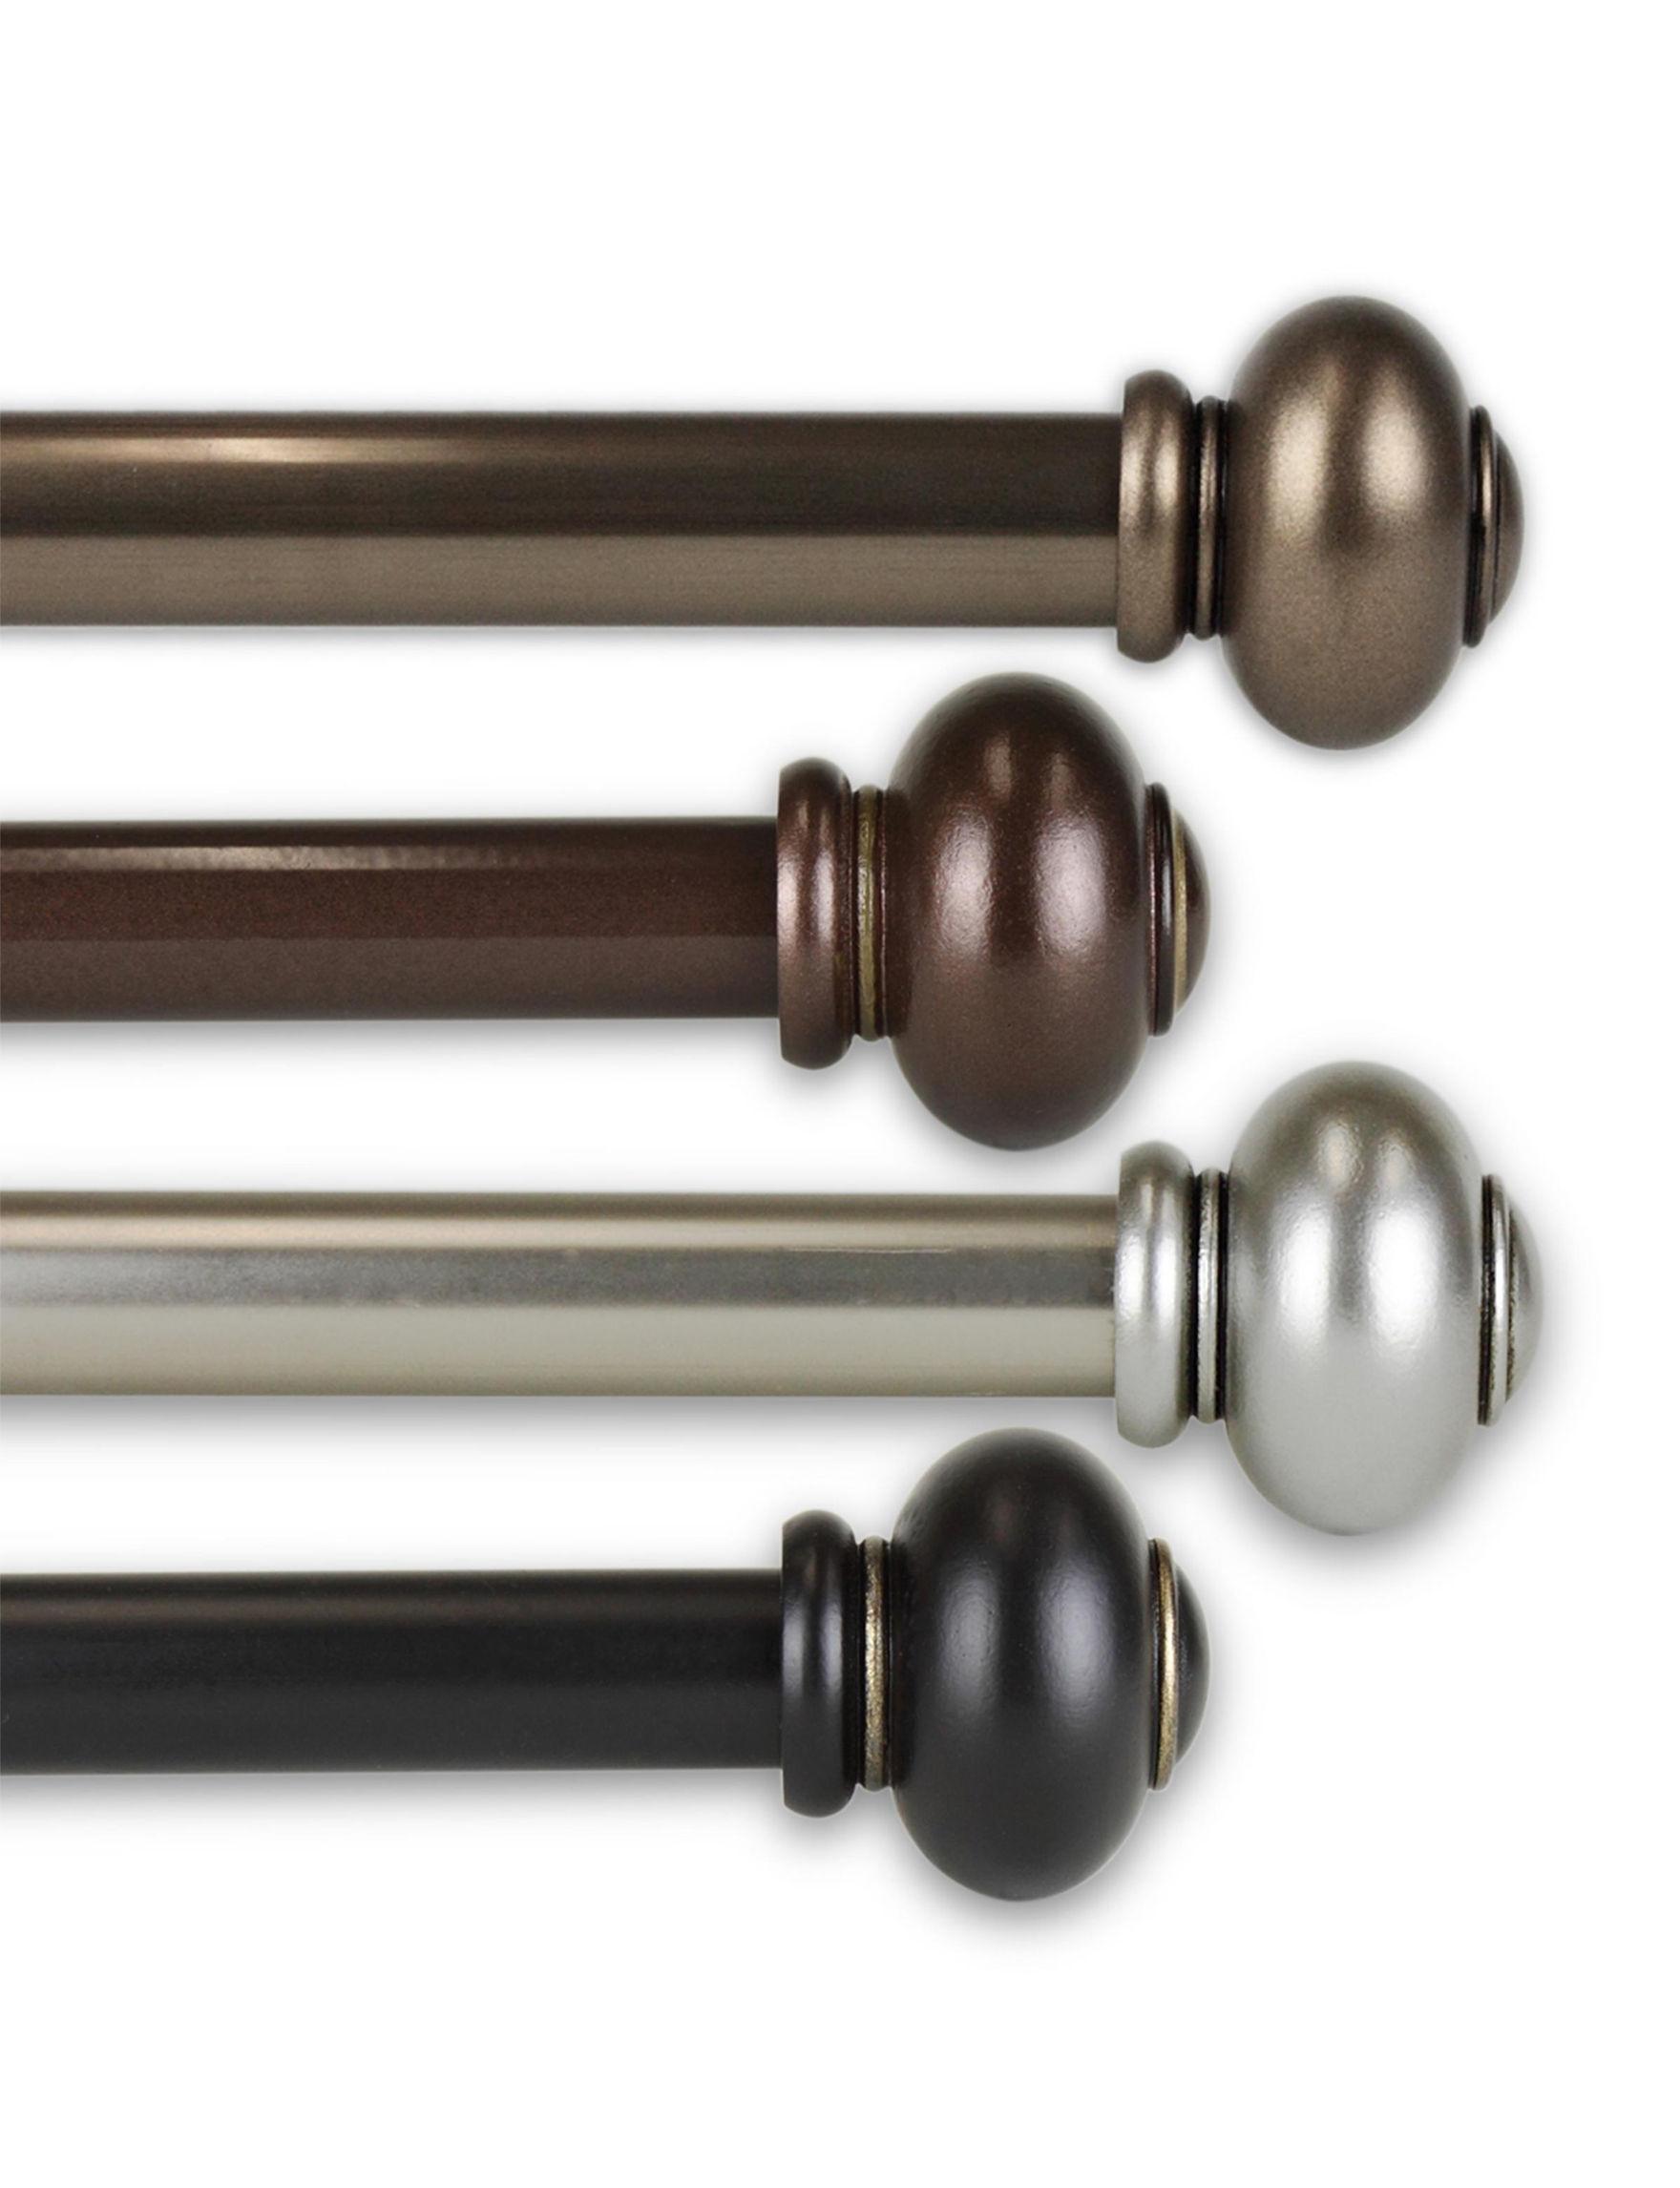 Rod Desyne Black Curtain Rods & Hardware Window Treatments